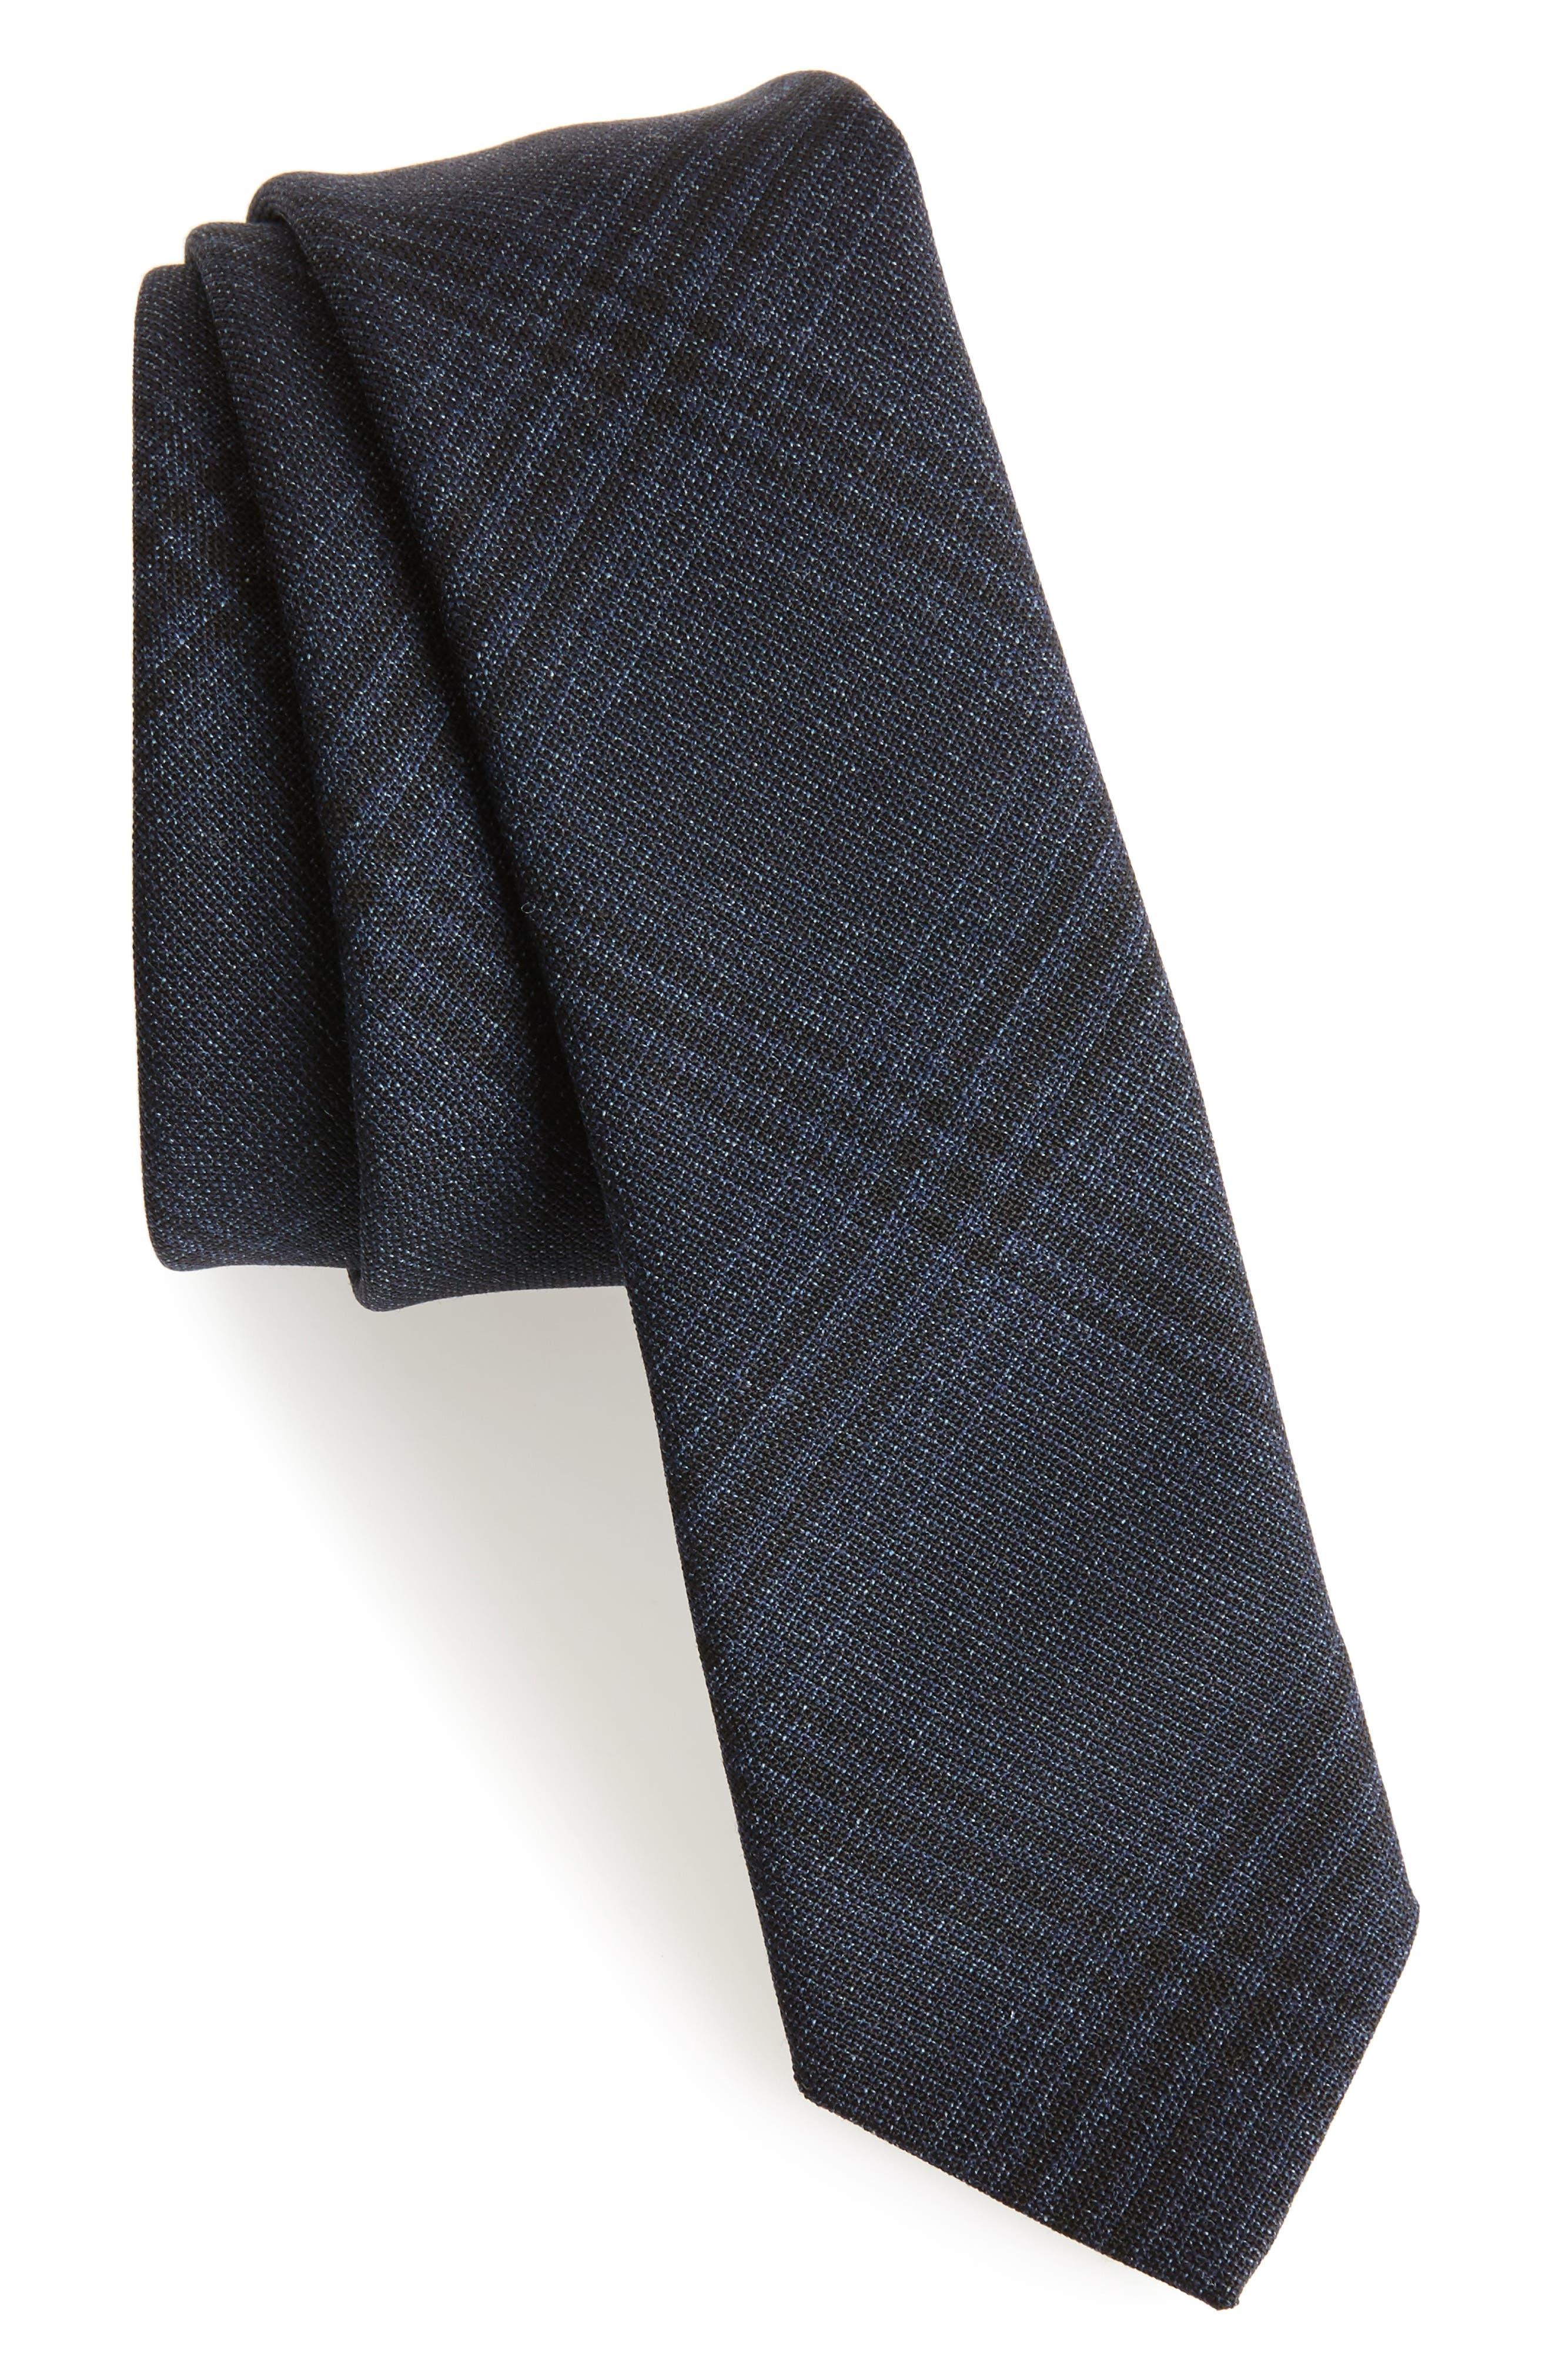 Main Image - Eleventy Plaid Wool Tie